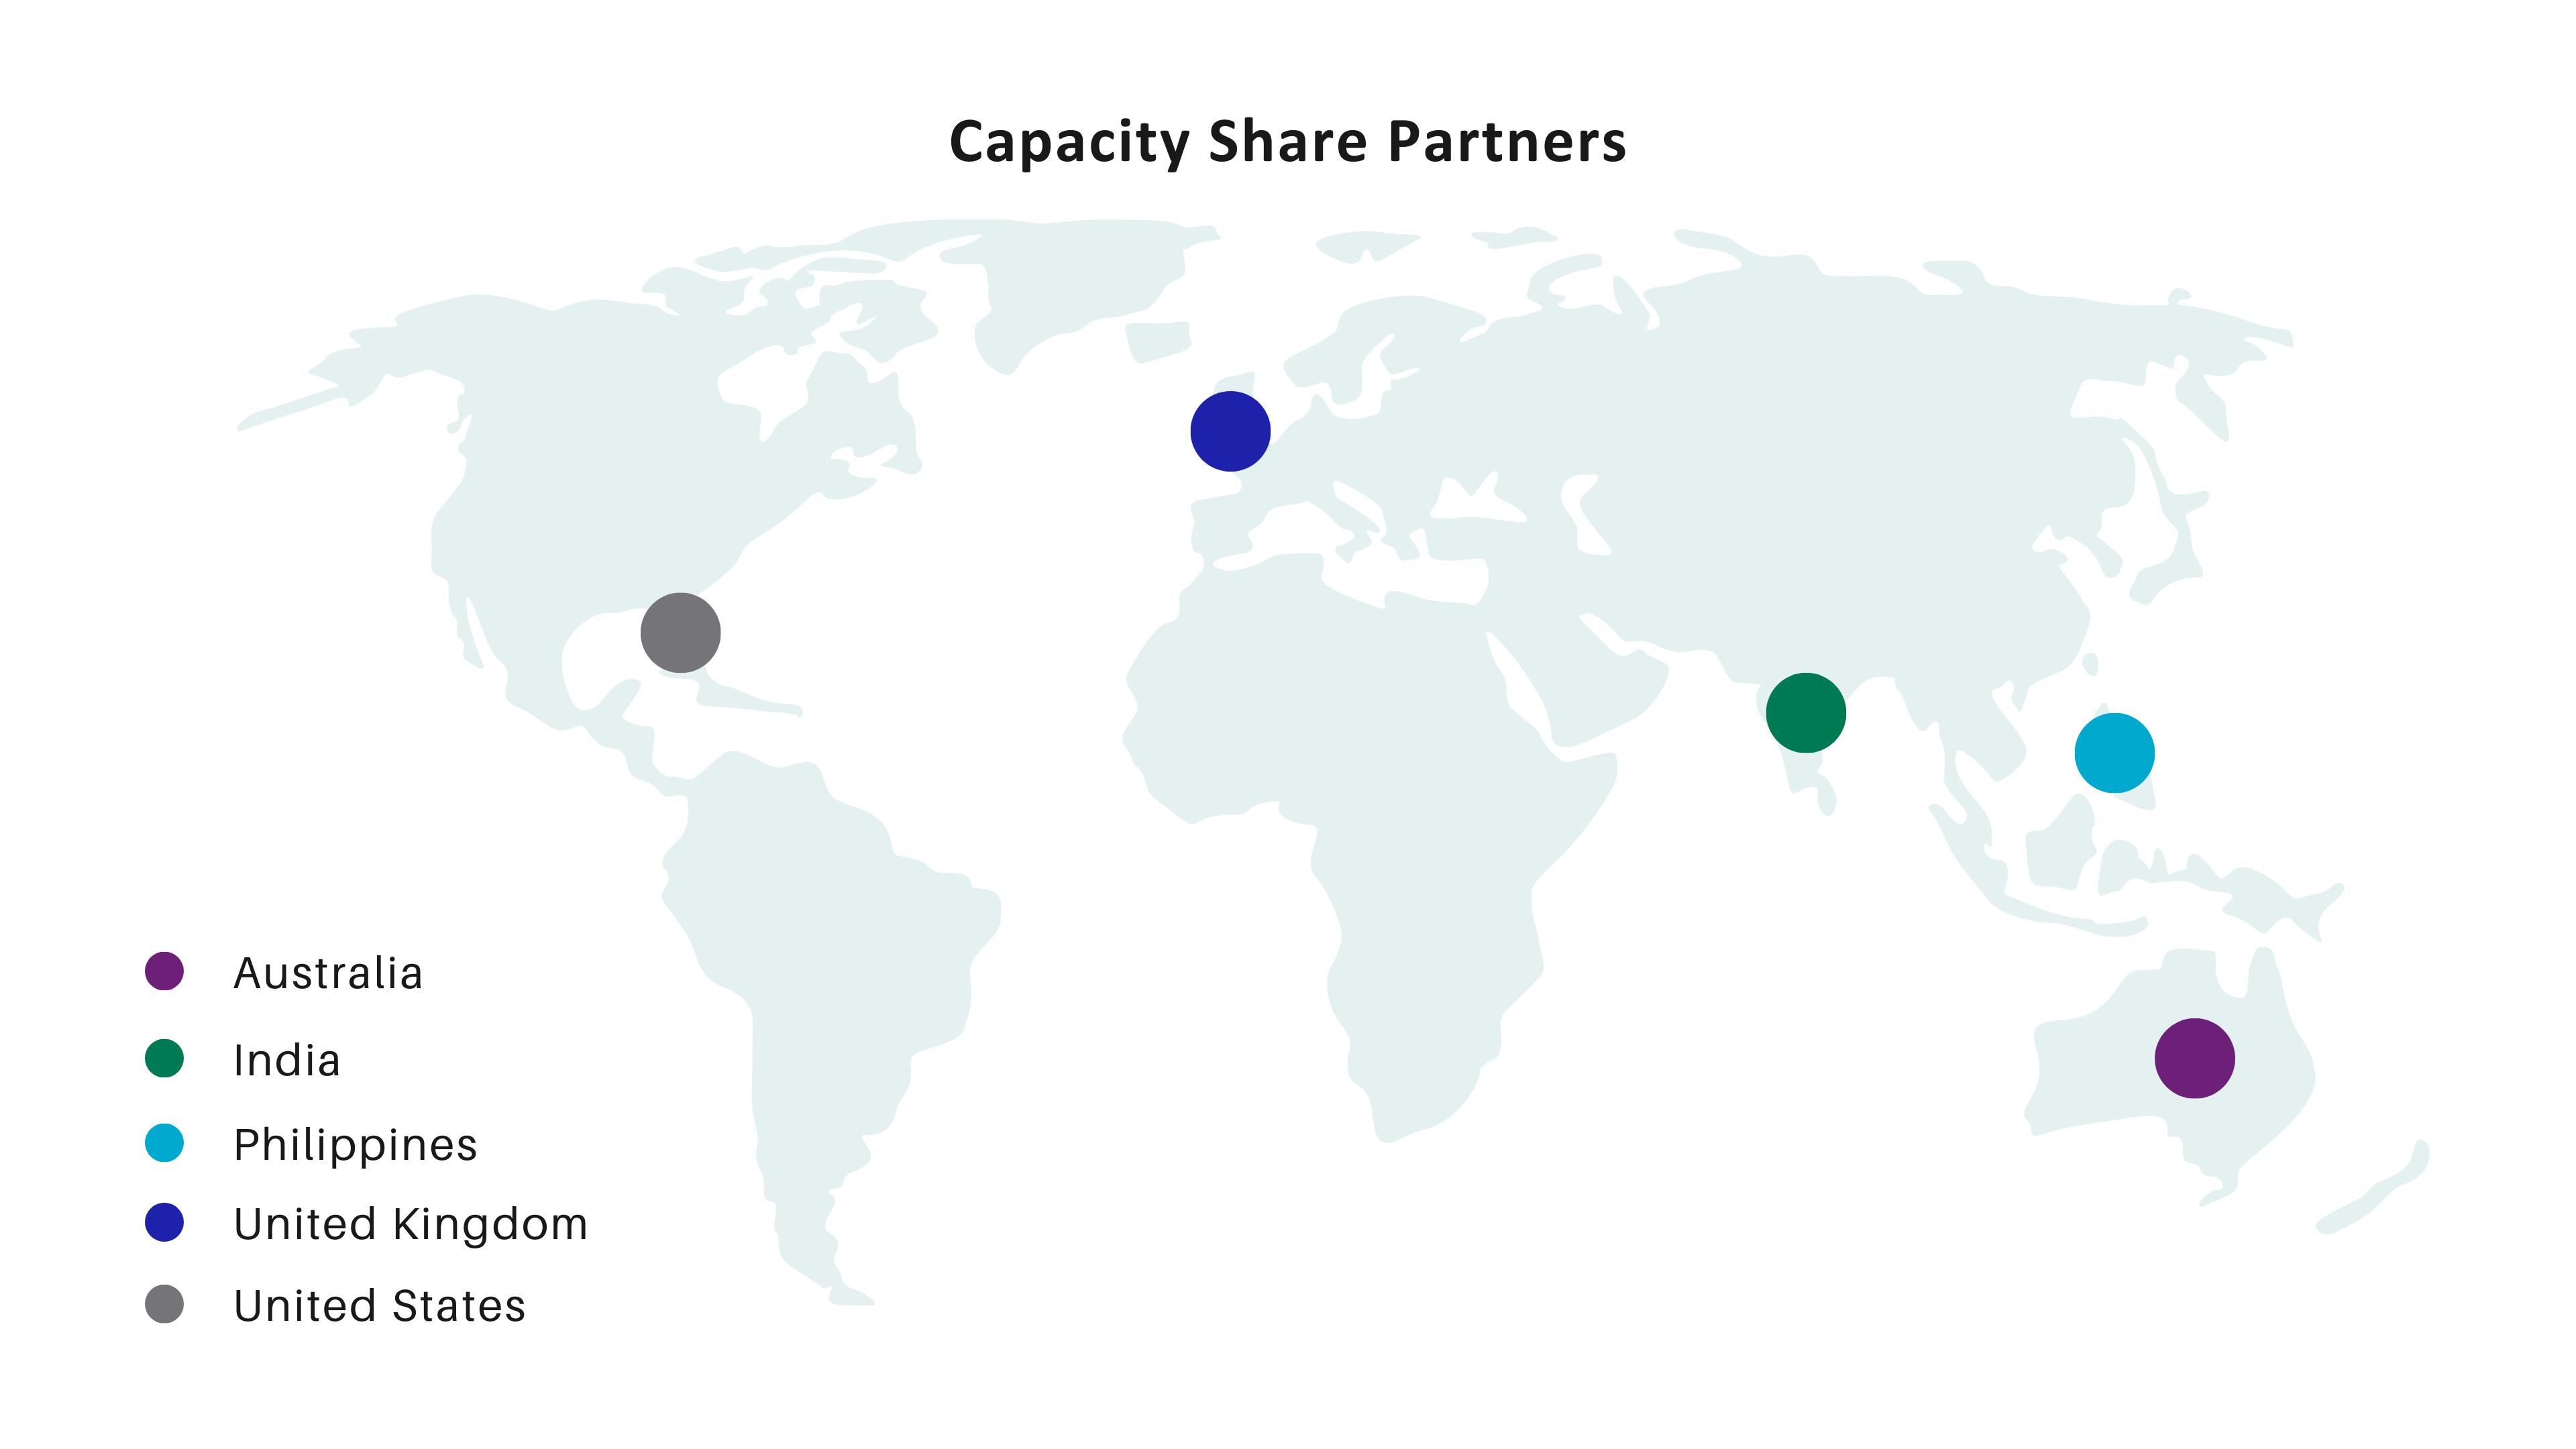 NovaSAR-1 Capacity Share Partners Map